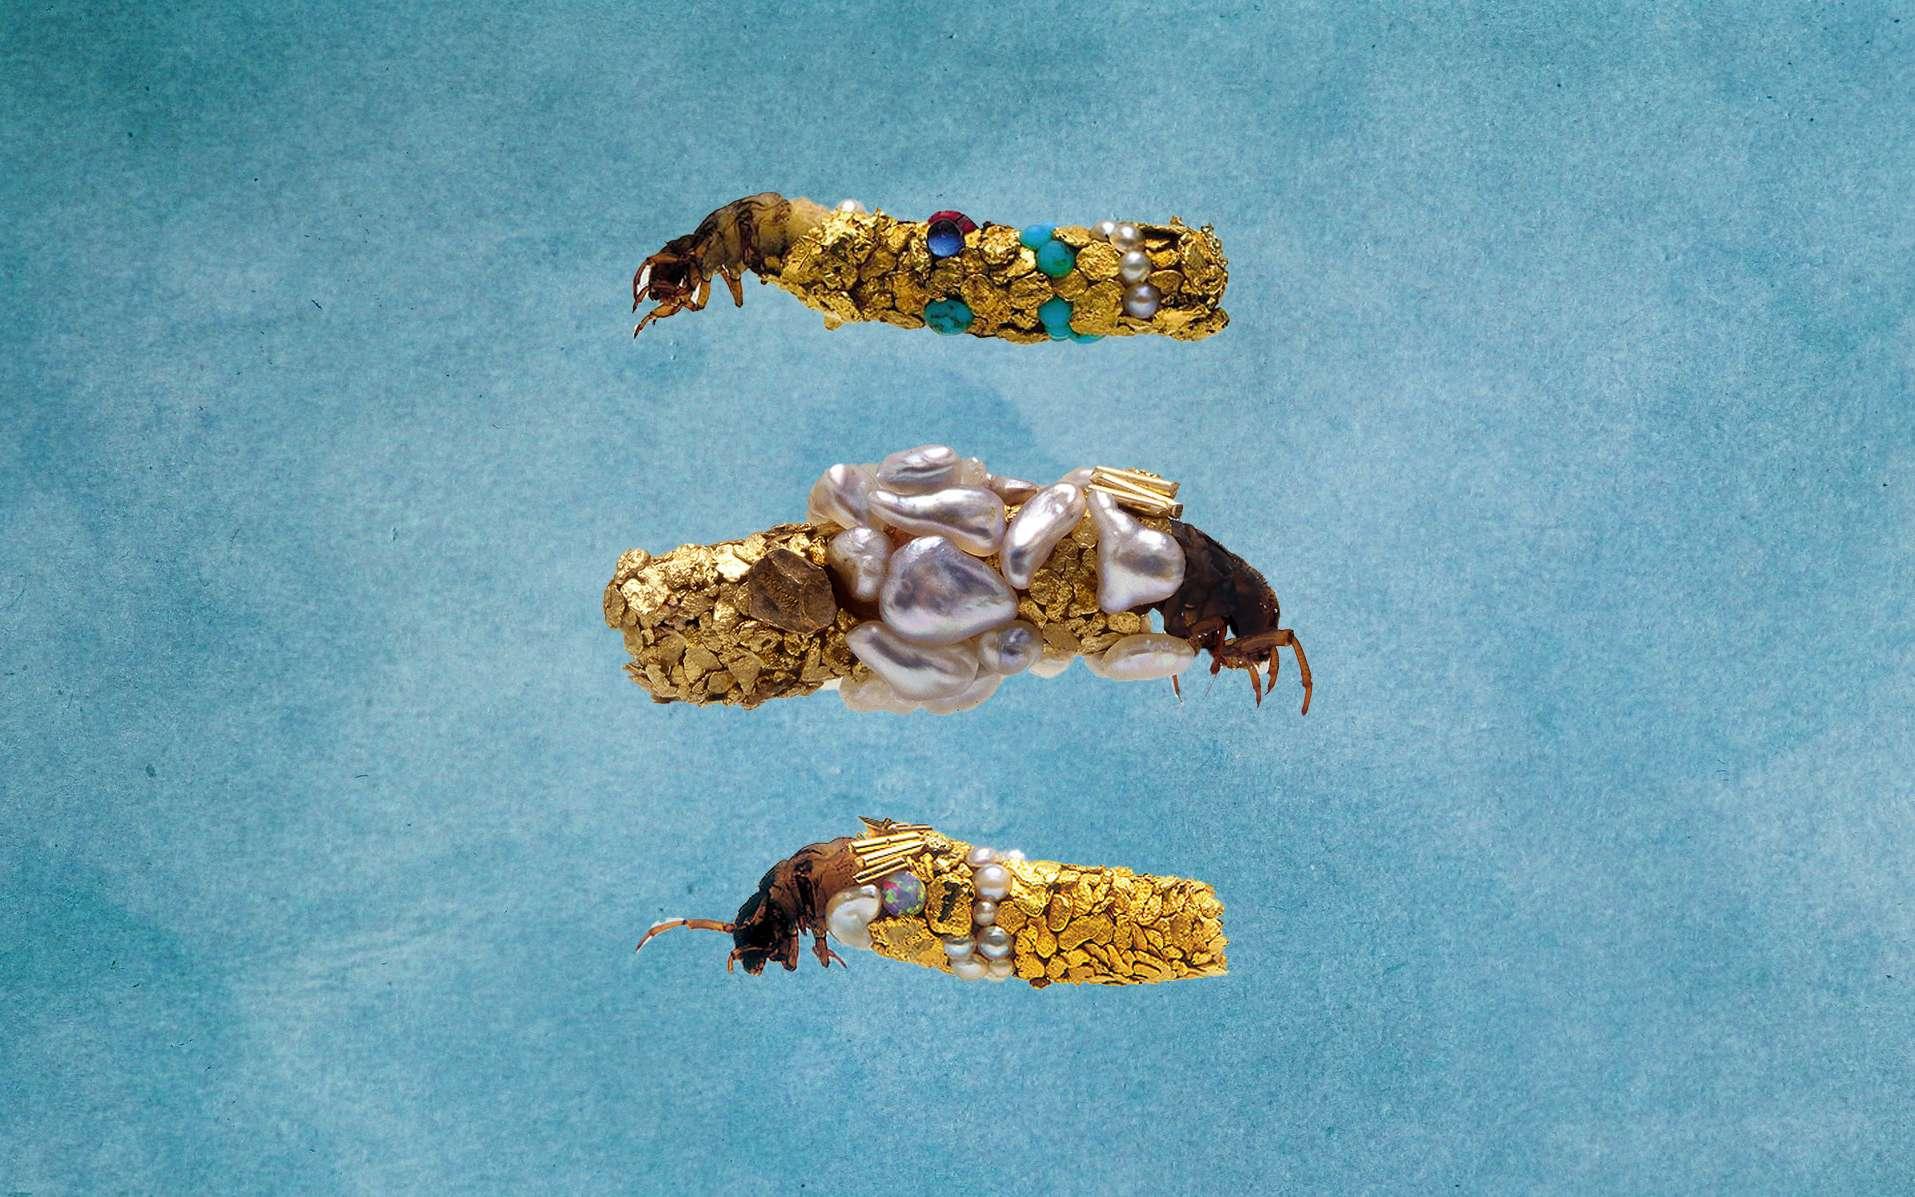 Des larves de phryganes habillées d'or. © Fabrice Gousset, Emma Hollen